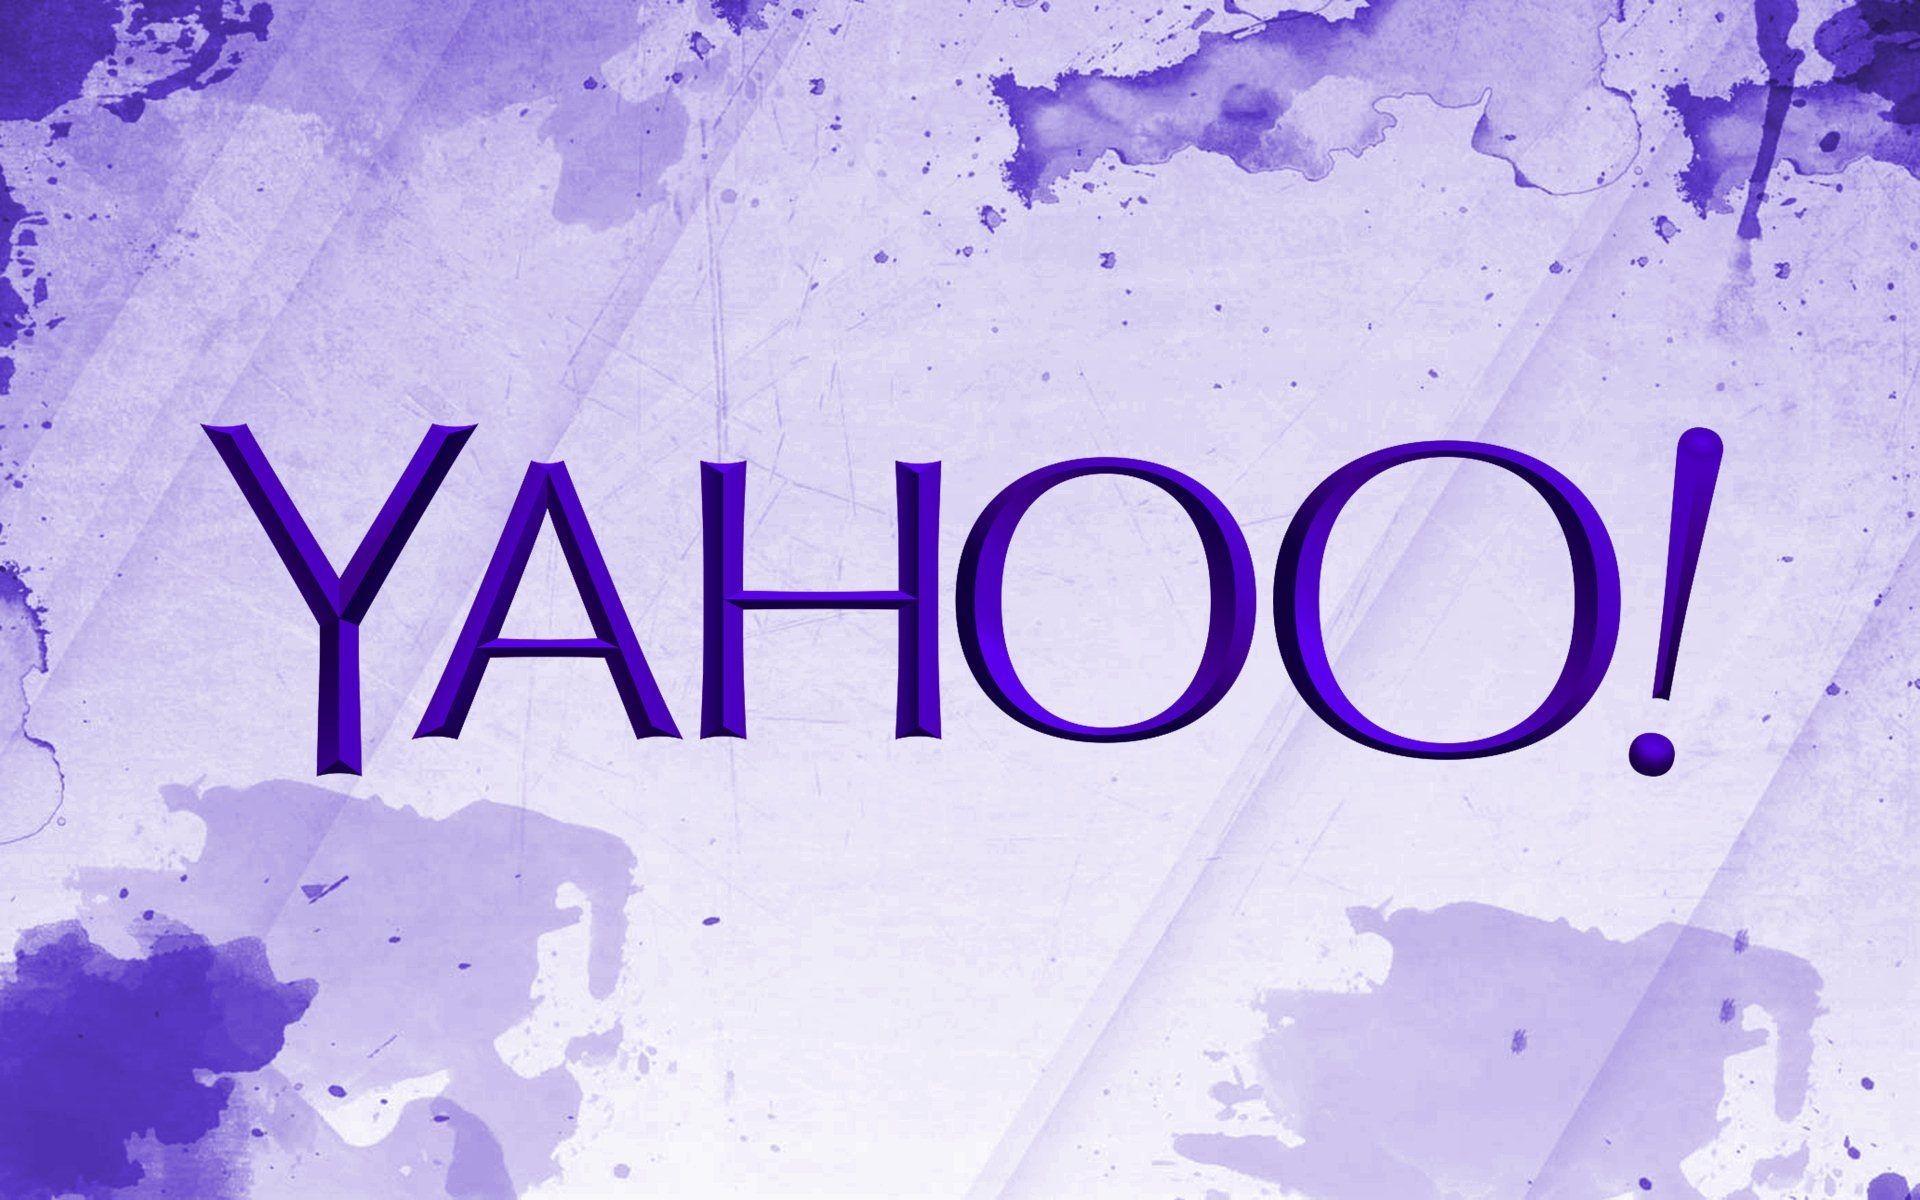 Yahoo Wallpaper 45 images 1920x1200